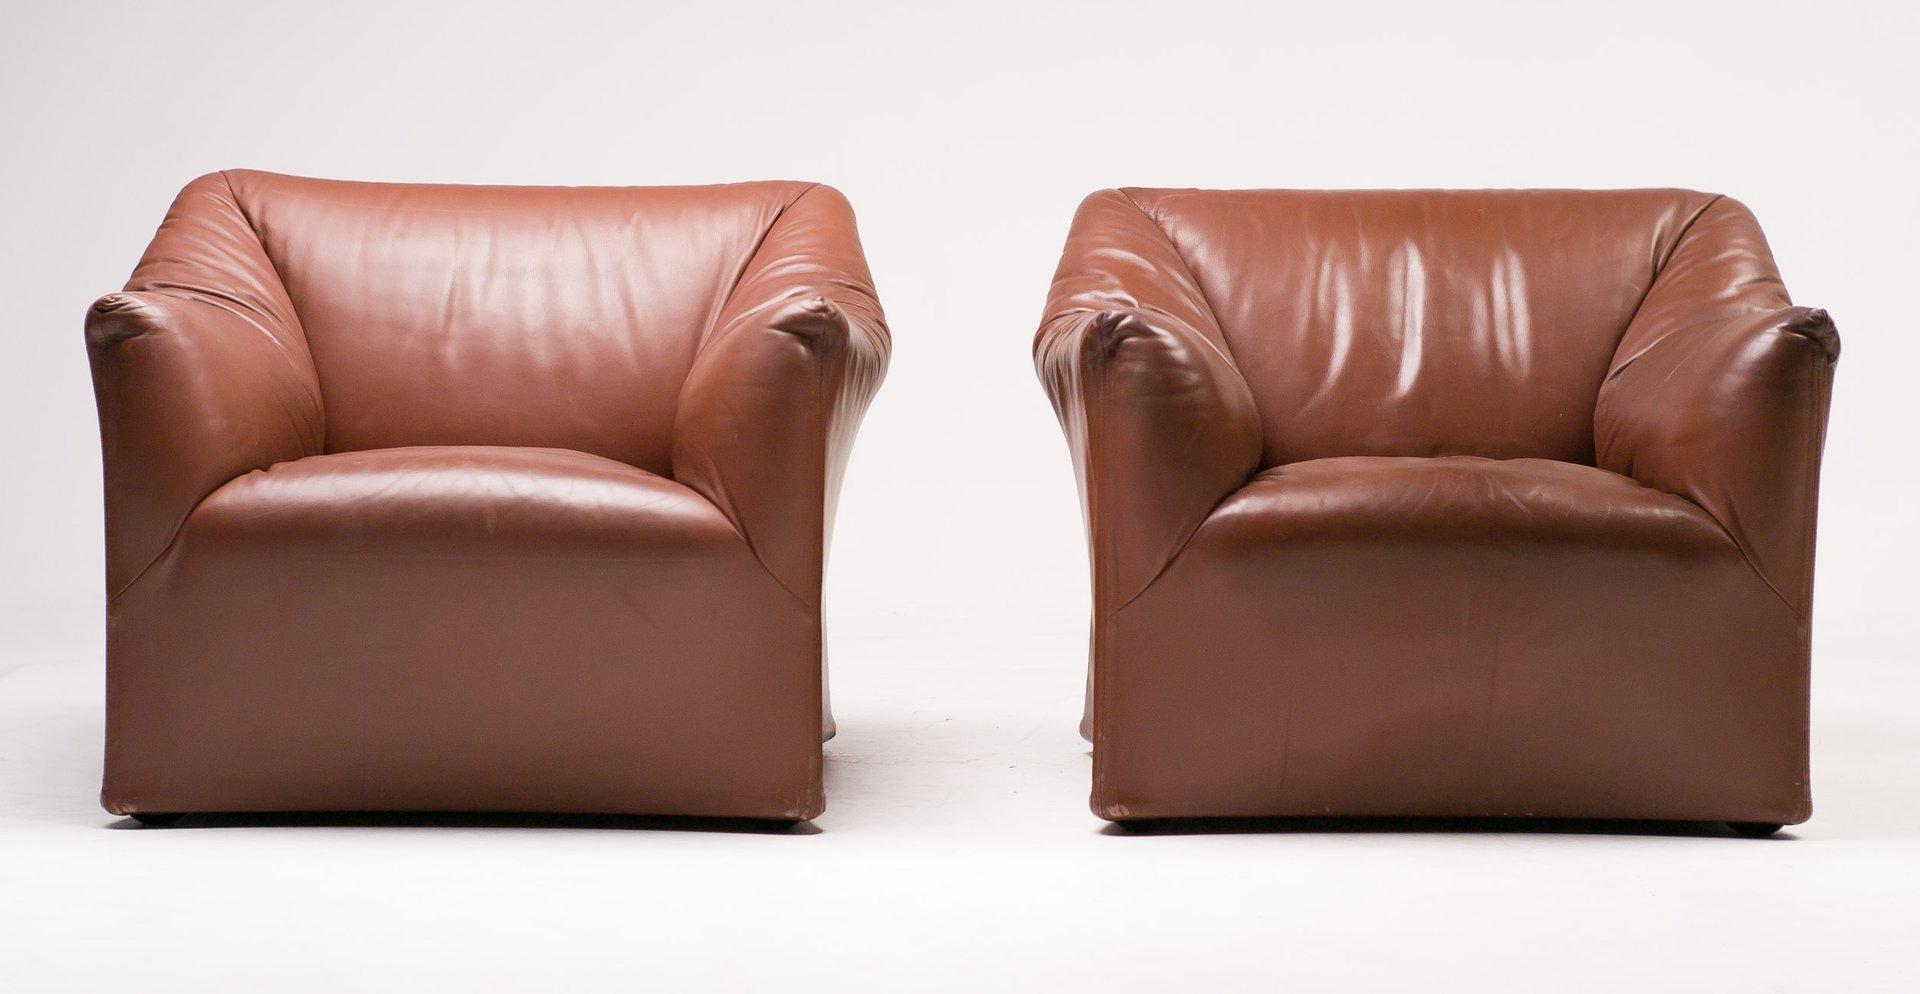 Sedie Vintage Pelle : Sedie in pelle di cassina ~ bukadar.info = galleria di sedie foto e